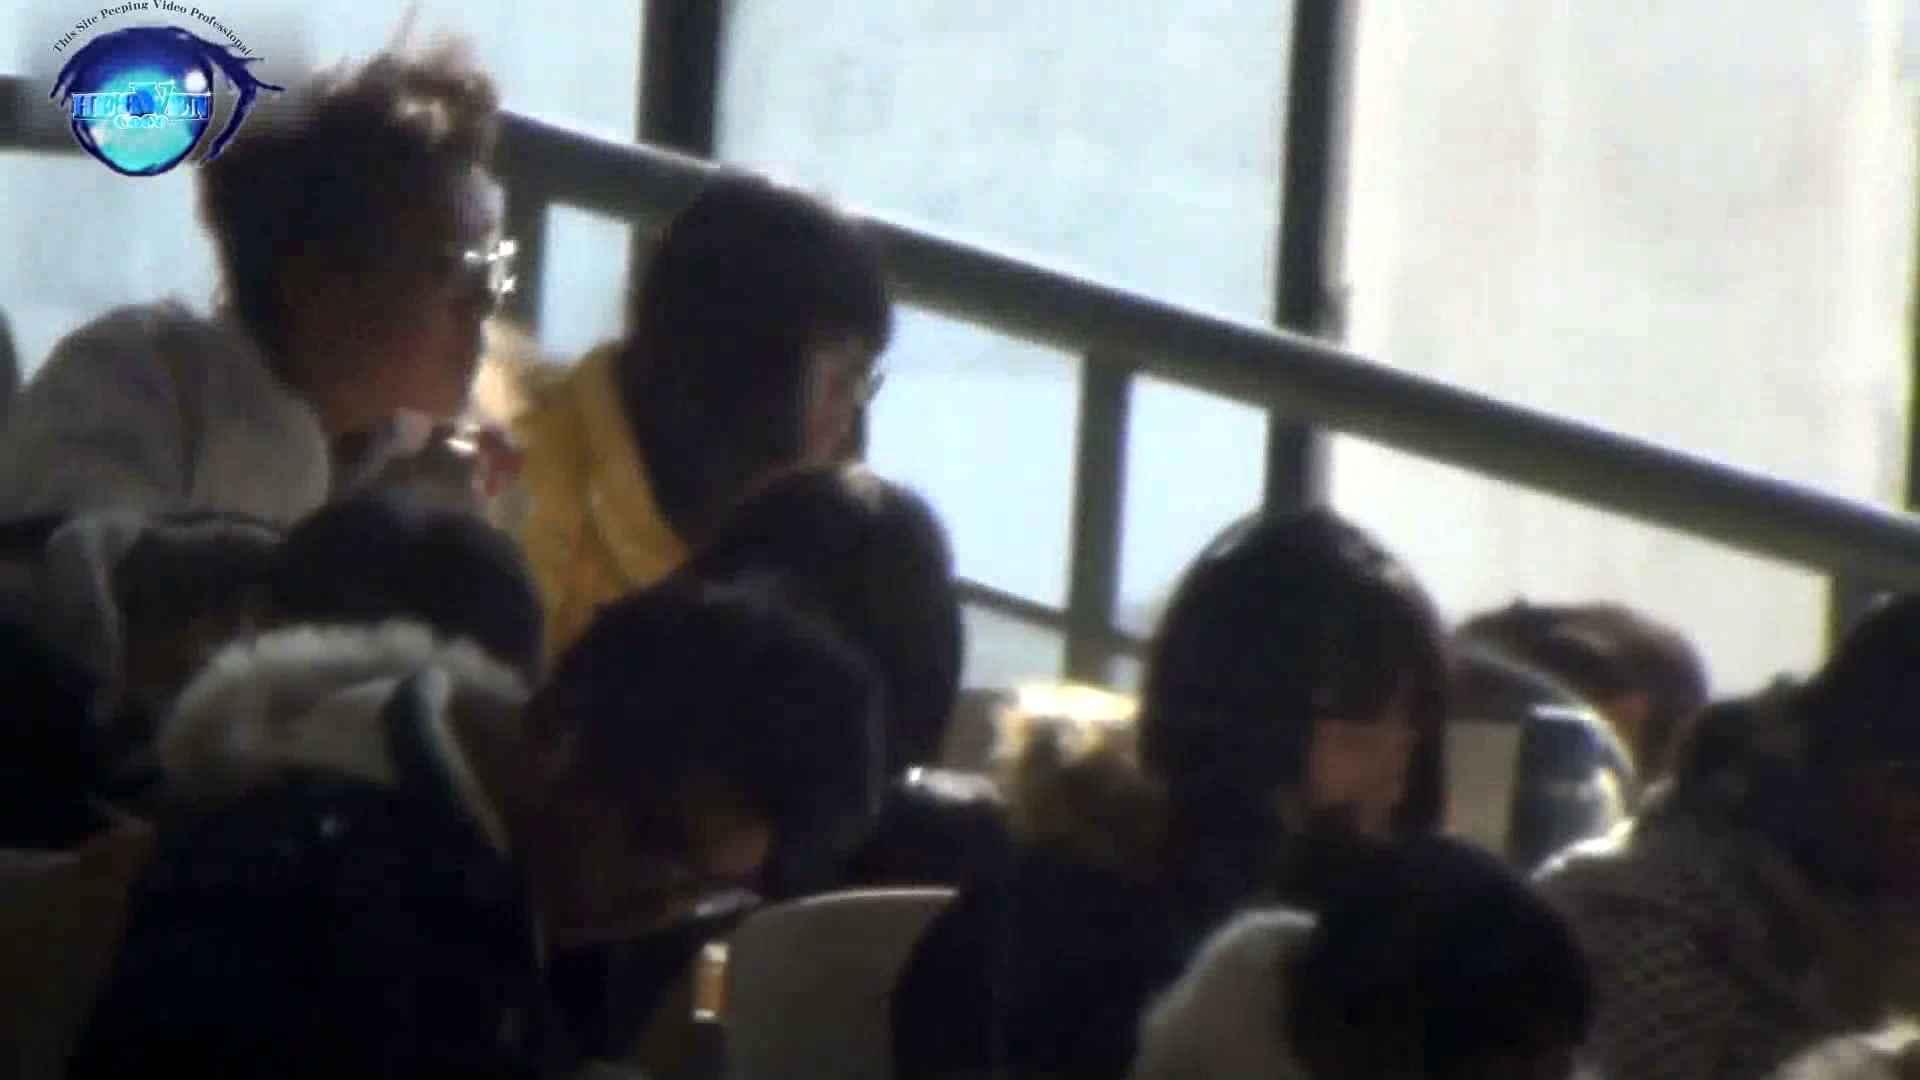 GOD HAND 芸術大学盗撮‼vol.26 OLエロ画像 | 盗撮  86PICs 9